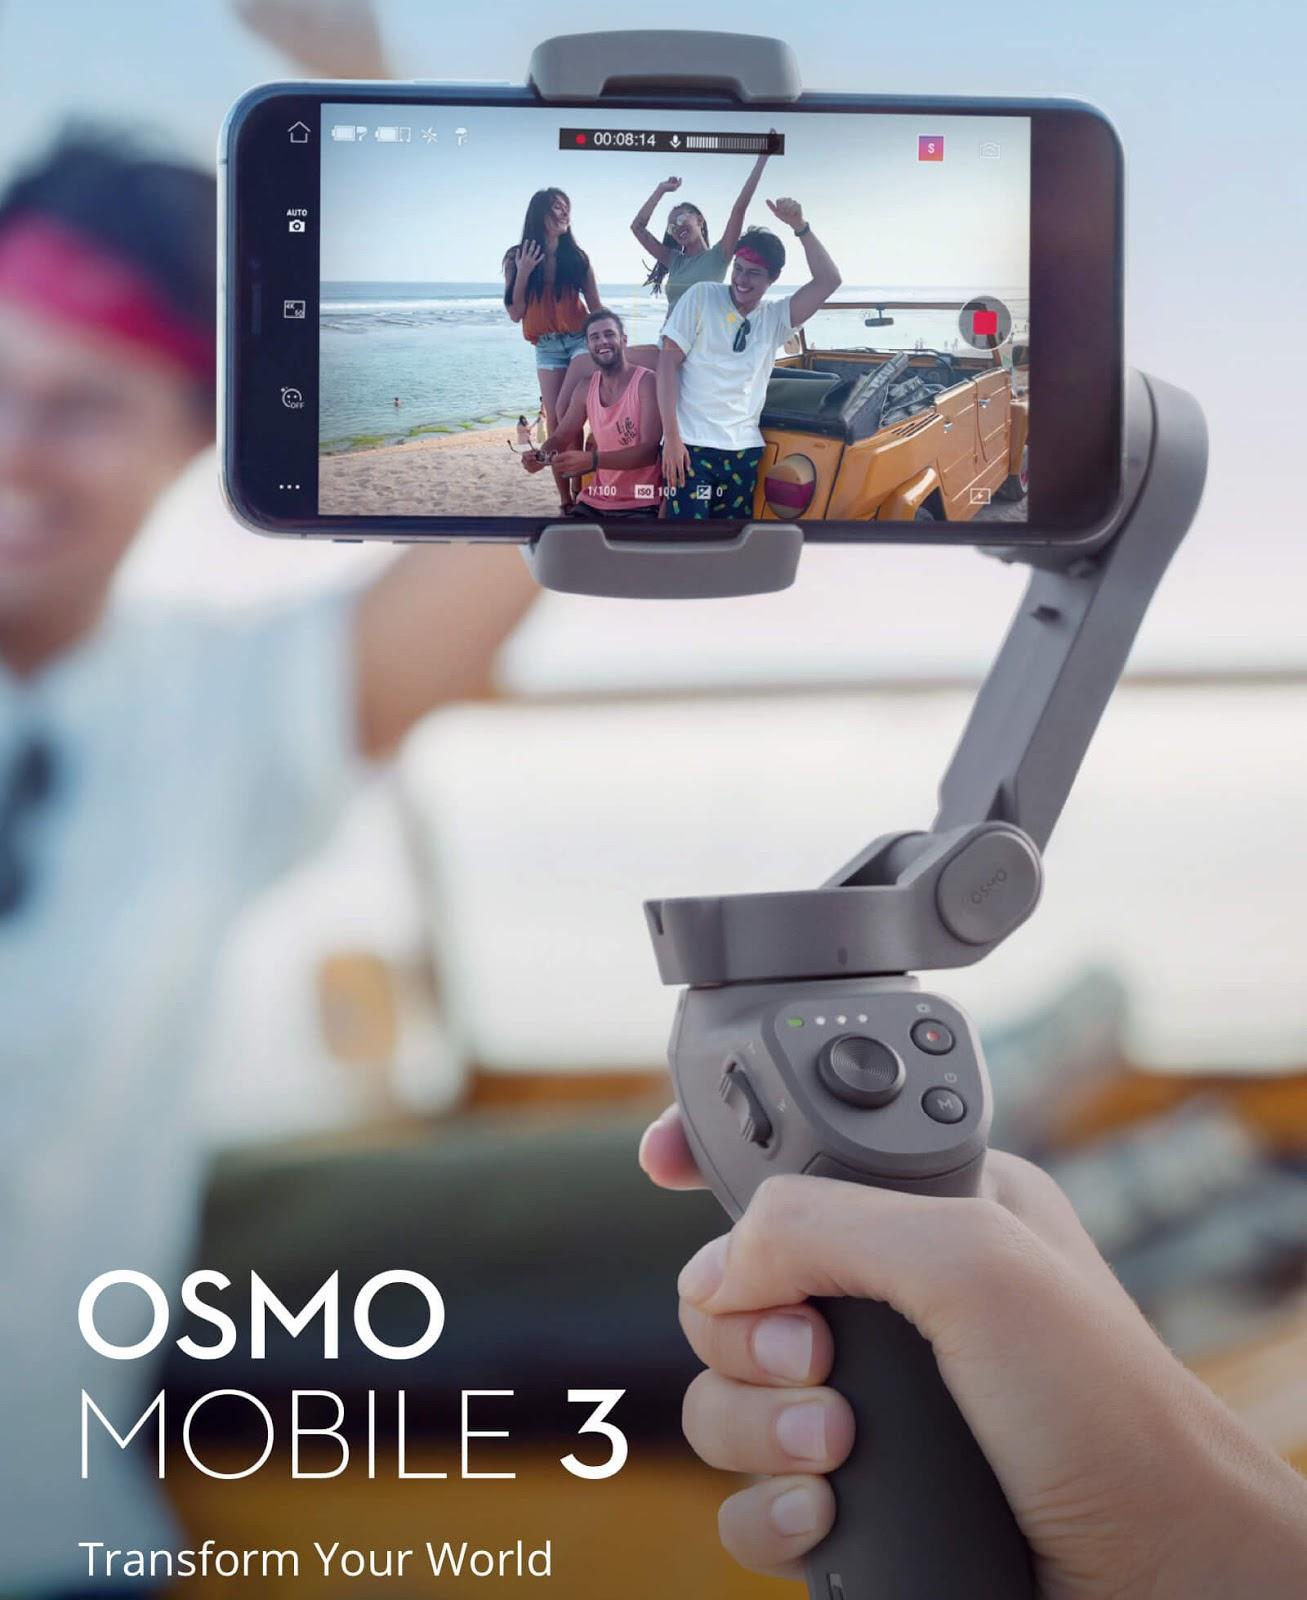 DJI تُطلق Osmo Mobile 3، وهو عبارة عن حامل ذكي وقابل للطي من أجل الهواتف الذكية